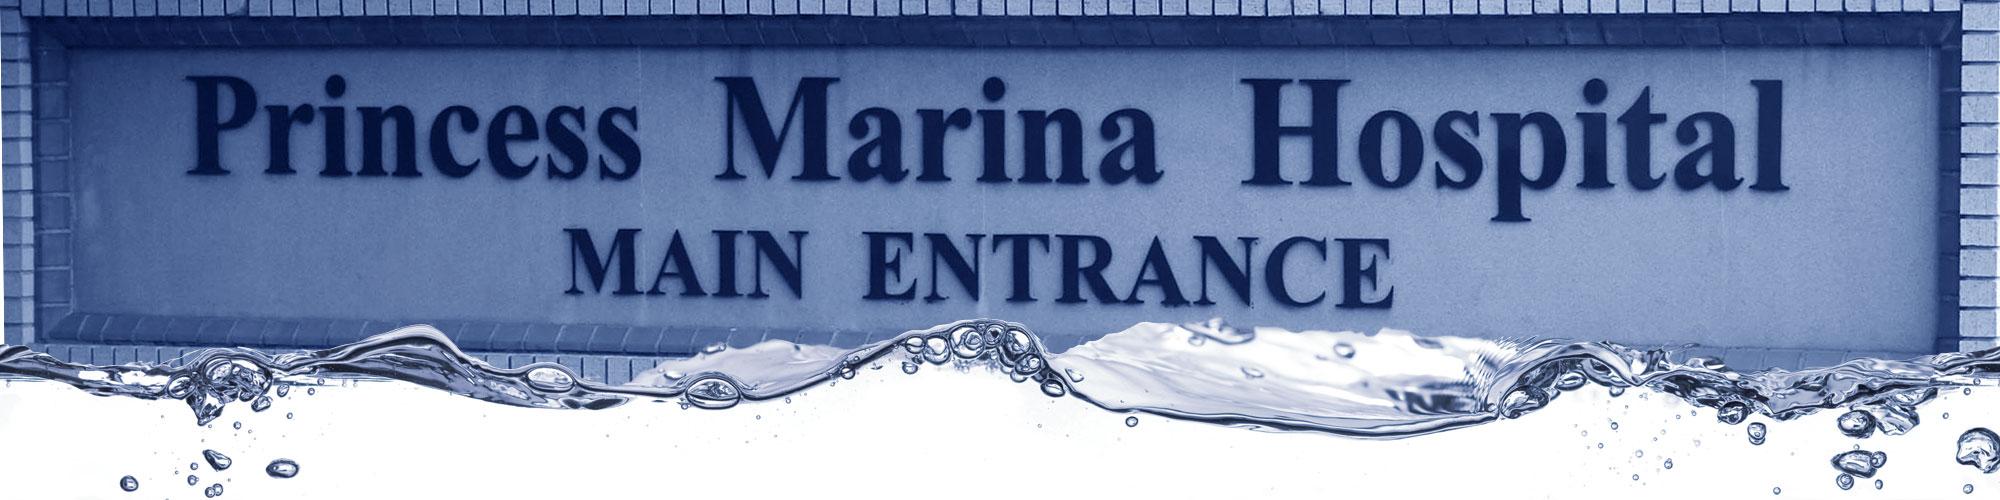 botswana-princess-marina-hospital-catering-laundry-equipment-africa